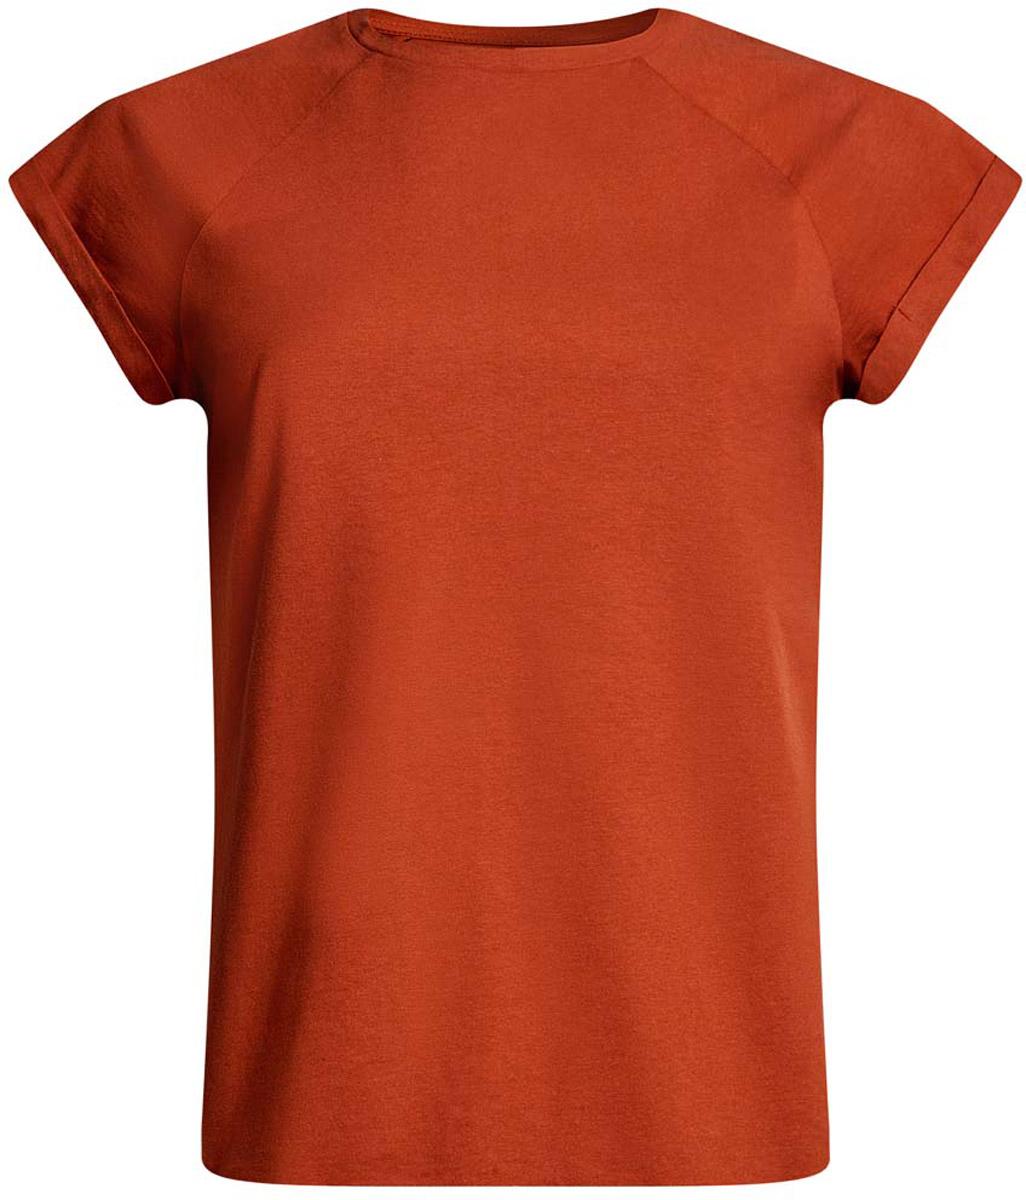 Футболка женская oodji Ultra, цвет: терракотовый. 14707001-4B/46154/3100N. Размер XL (50) футболка oodji футболка